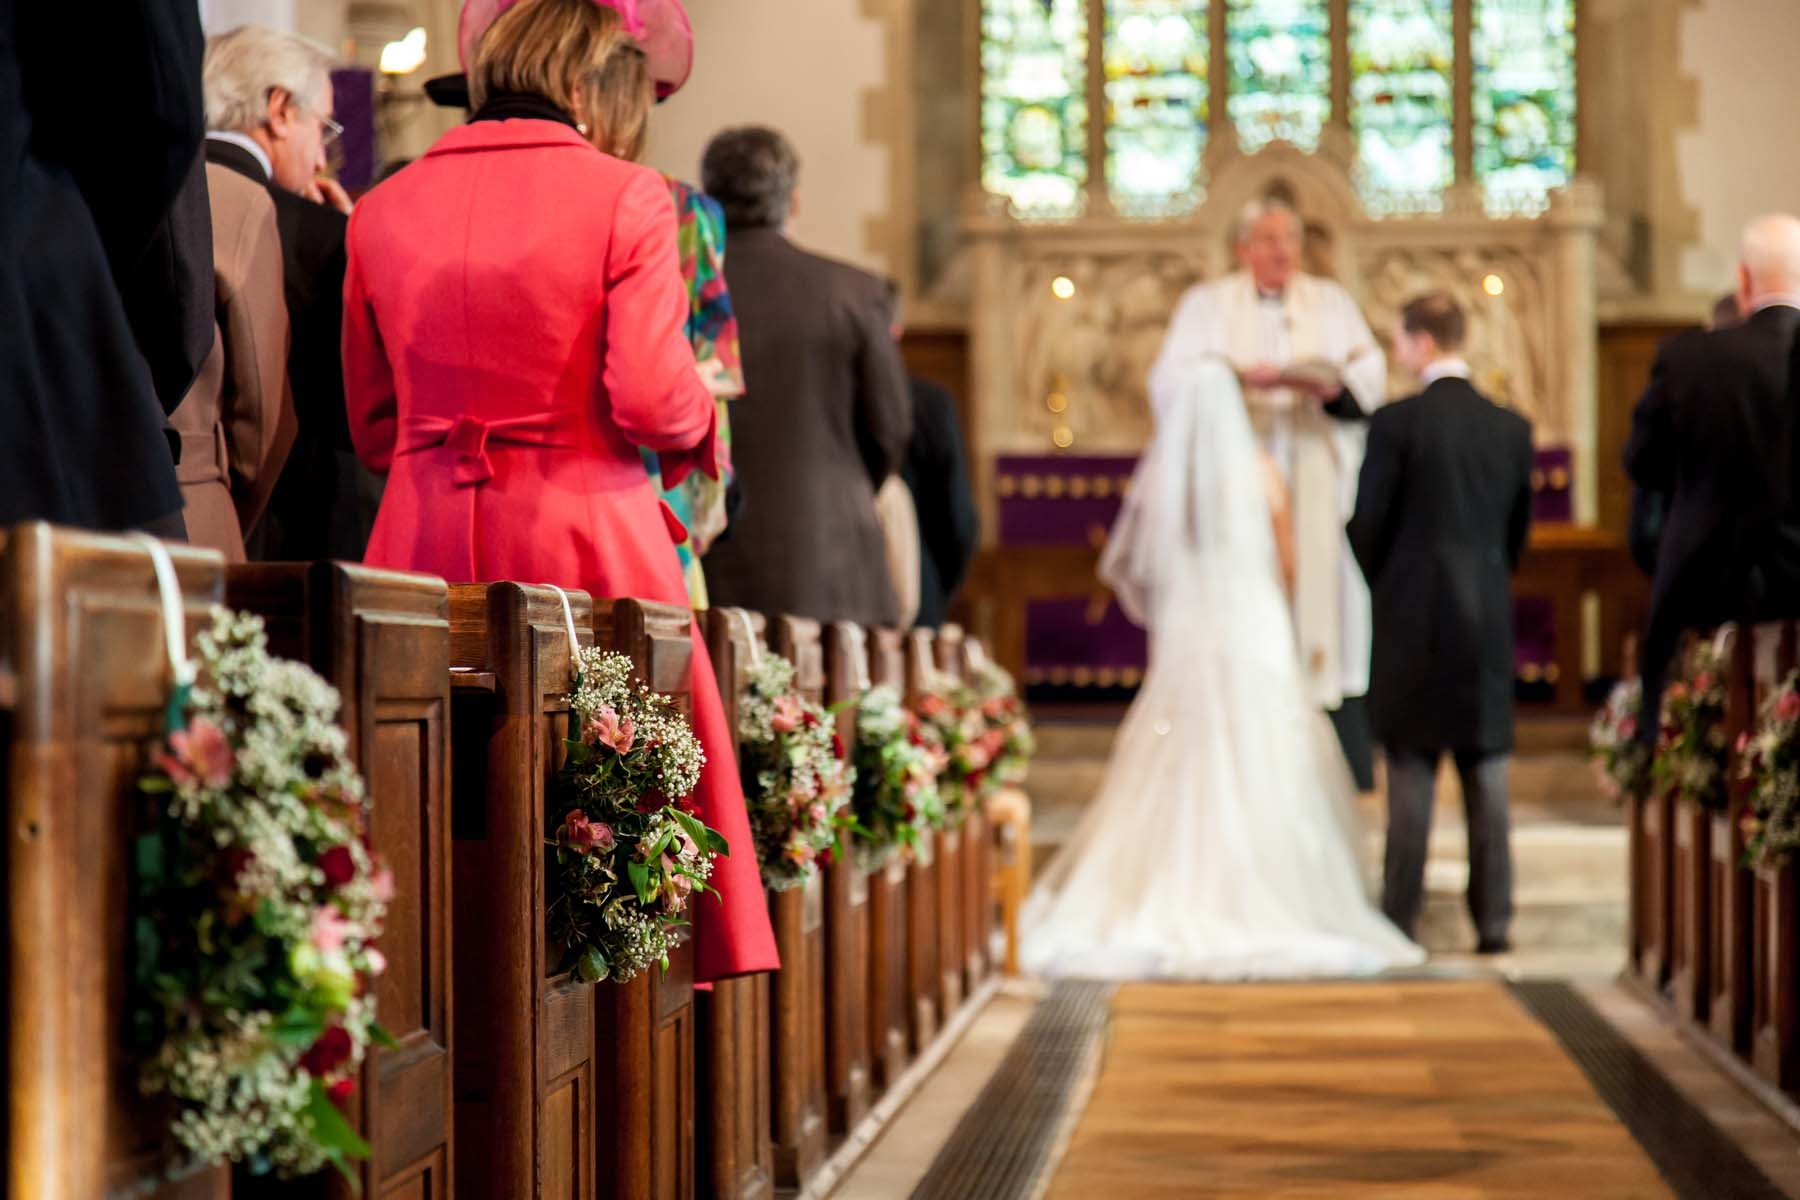 Sussex & Surrey Wedding Photographer - Ceremony (11)